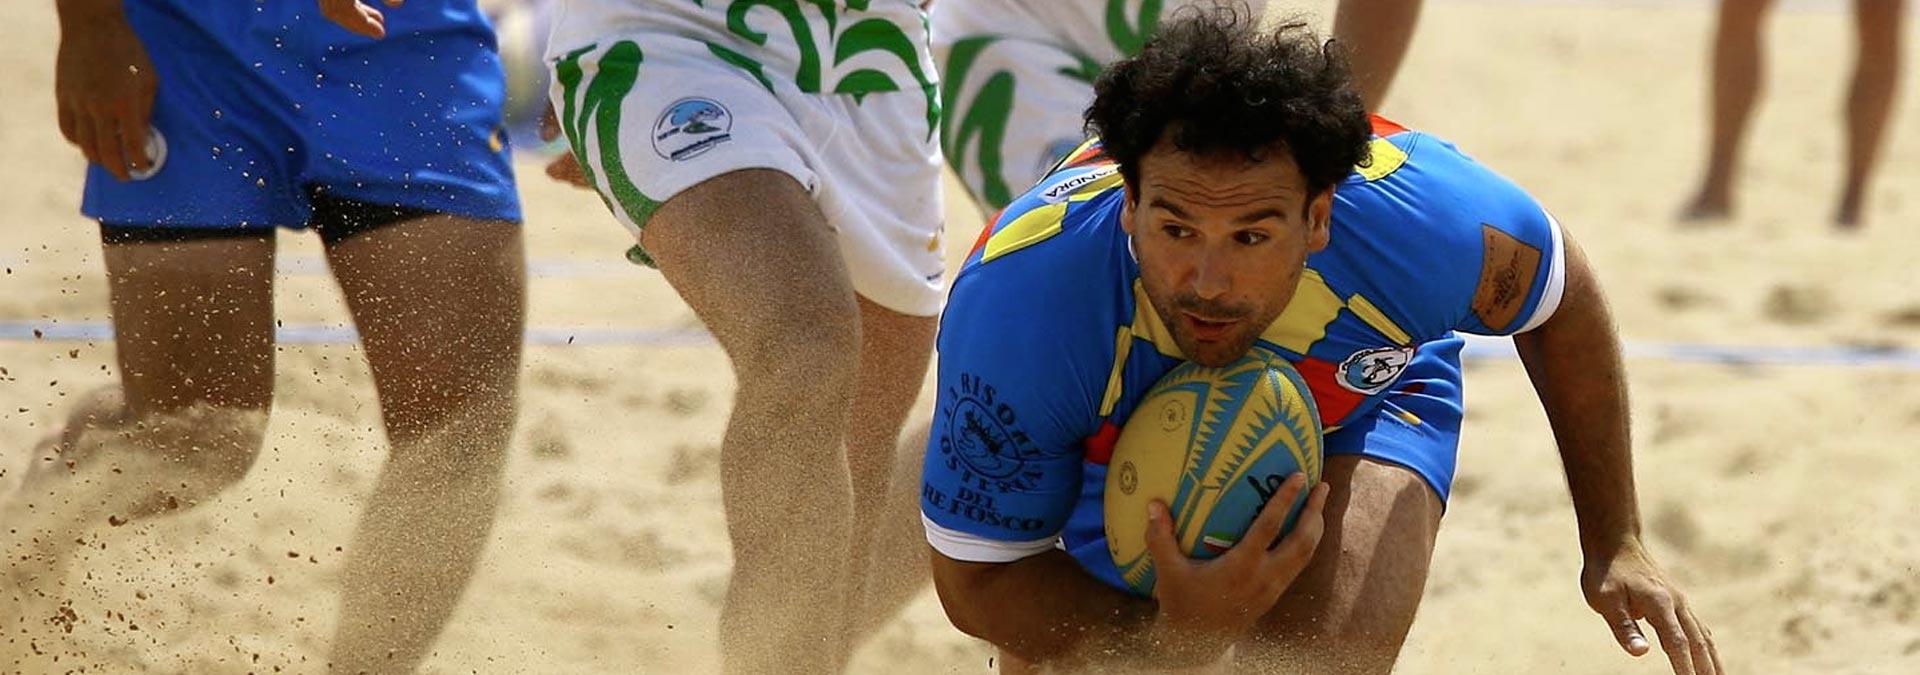 Beach Rugby Festival